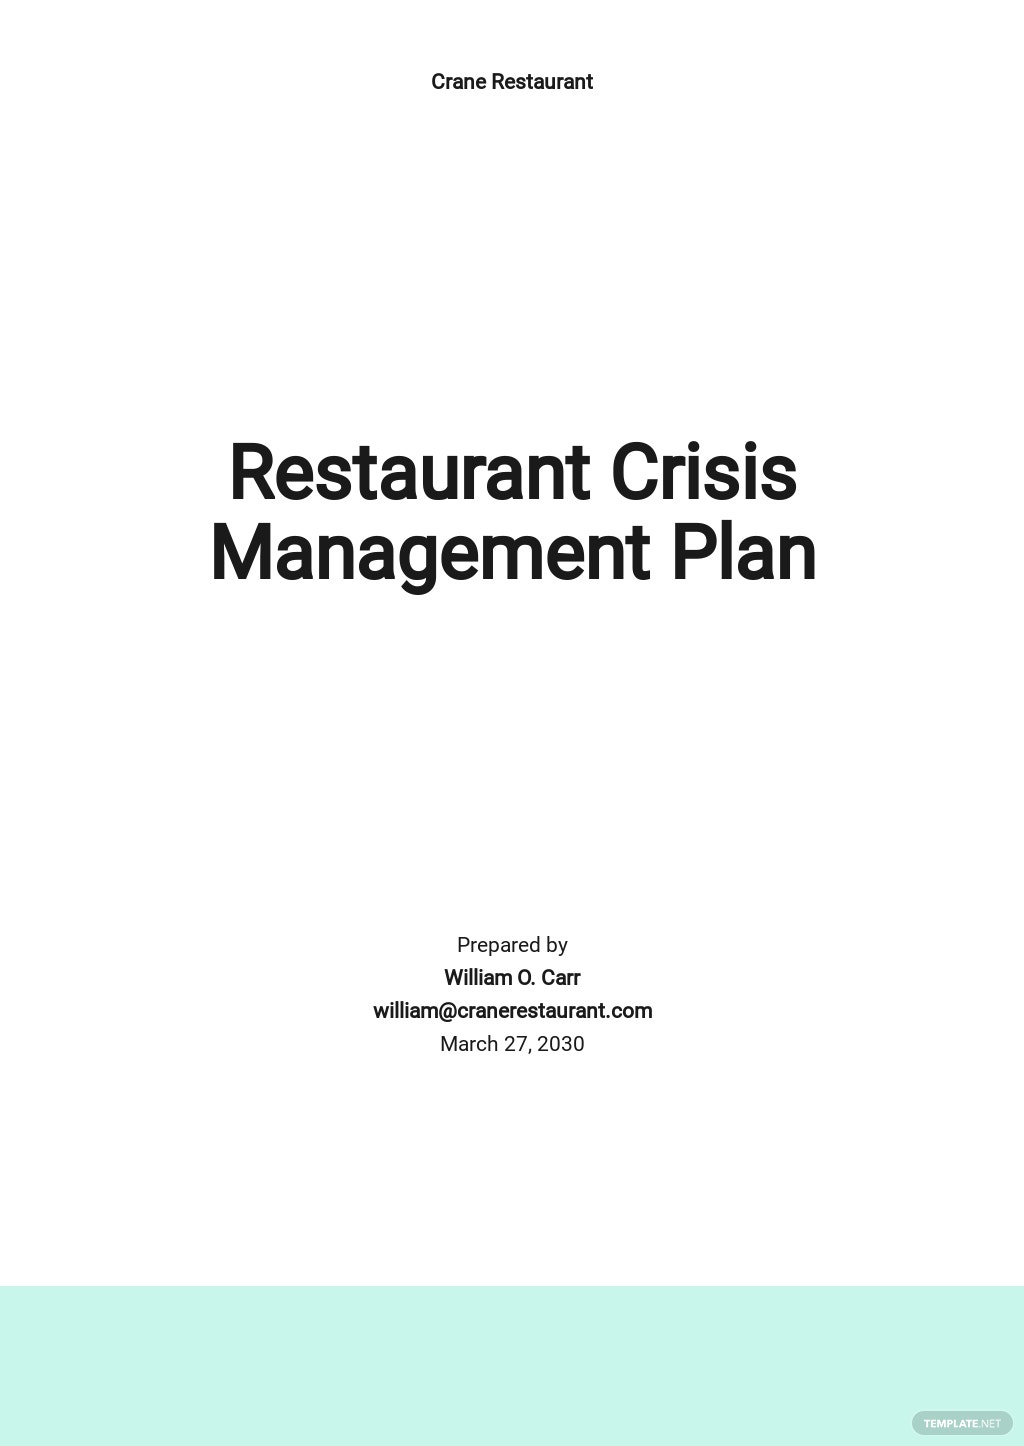 Restaurant Crisis Management Plan Template